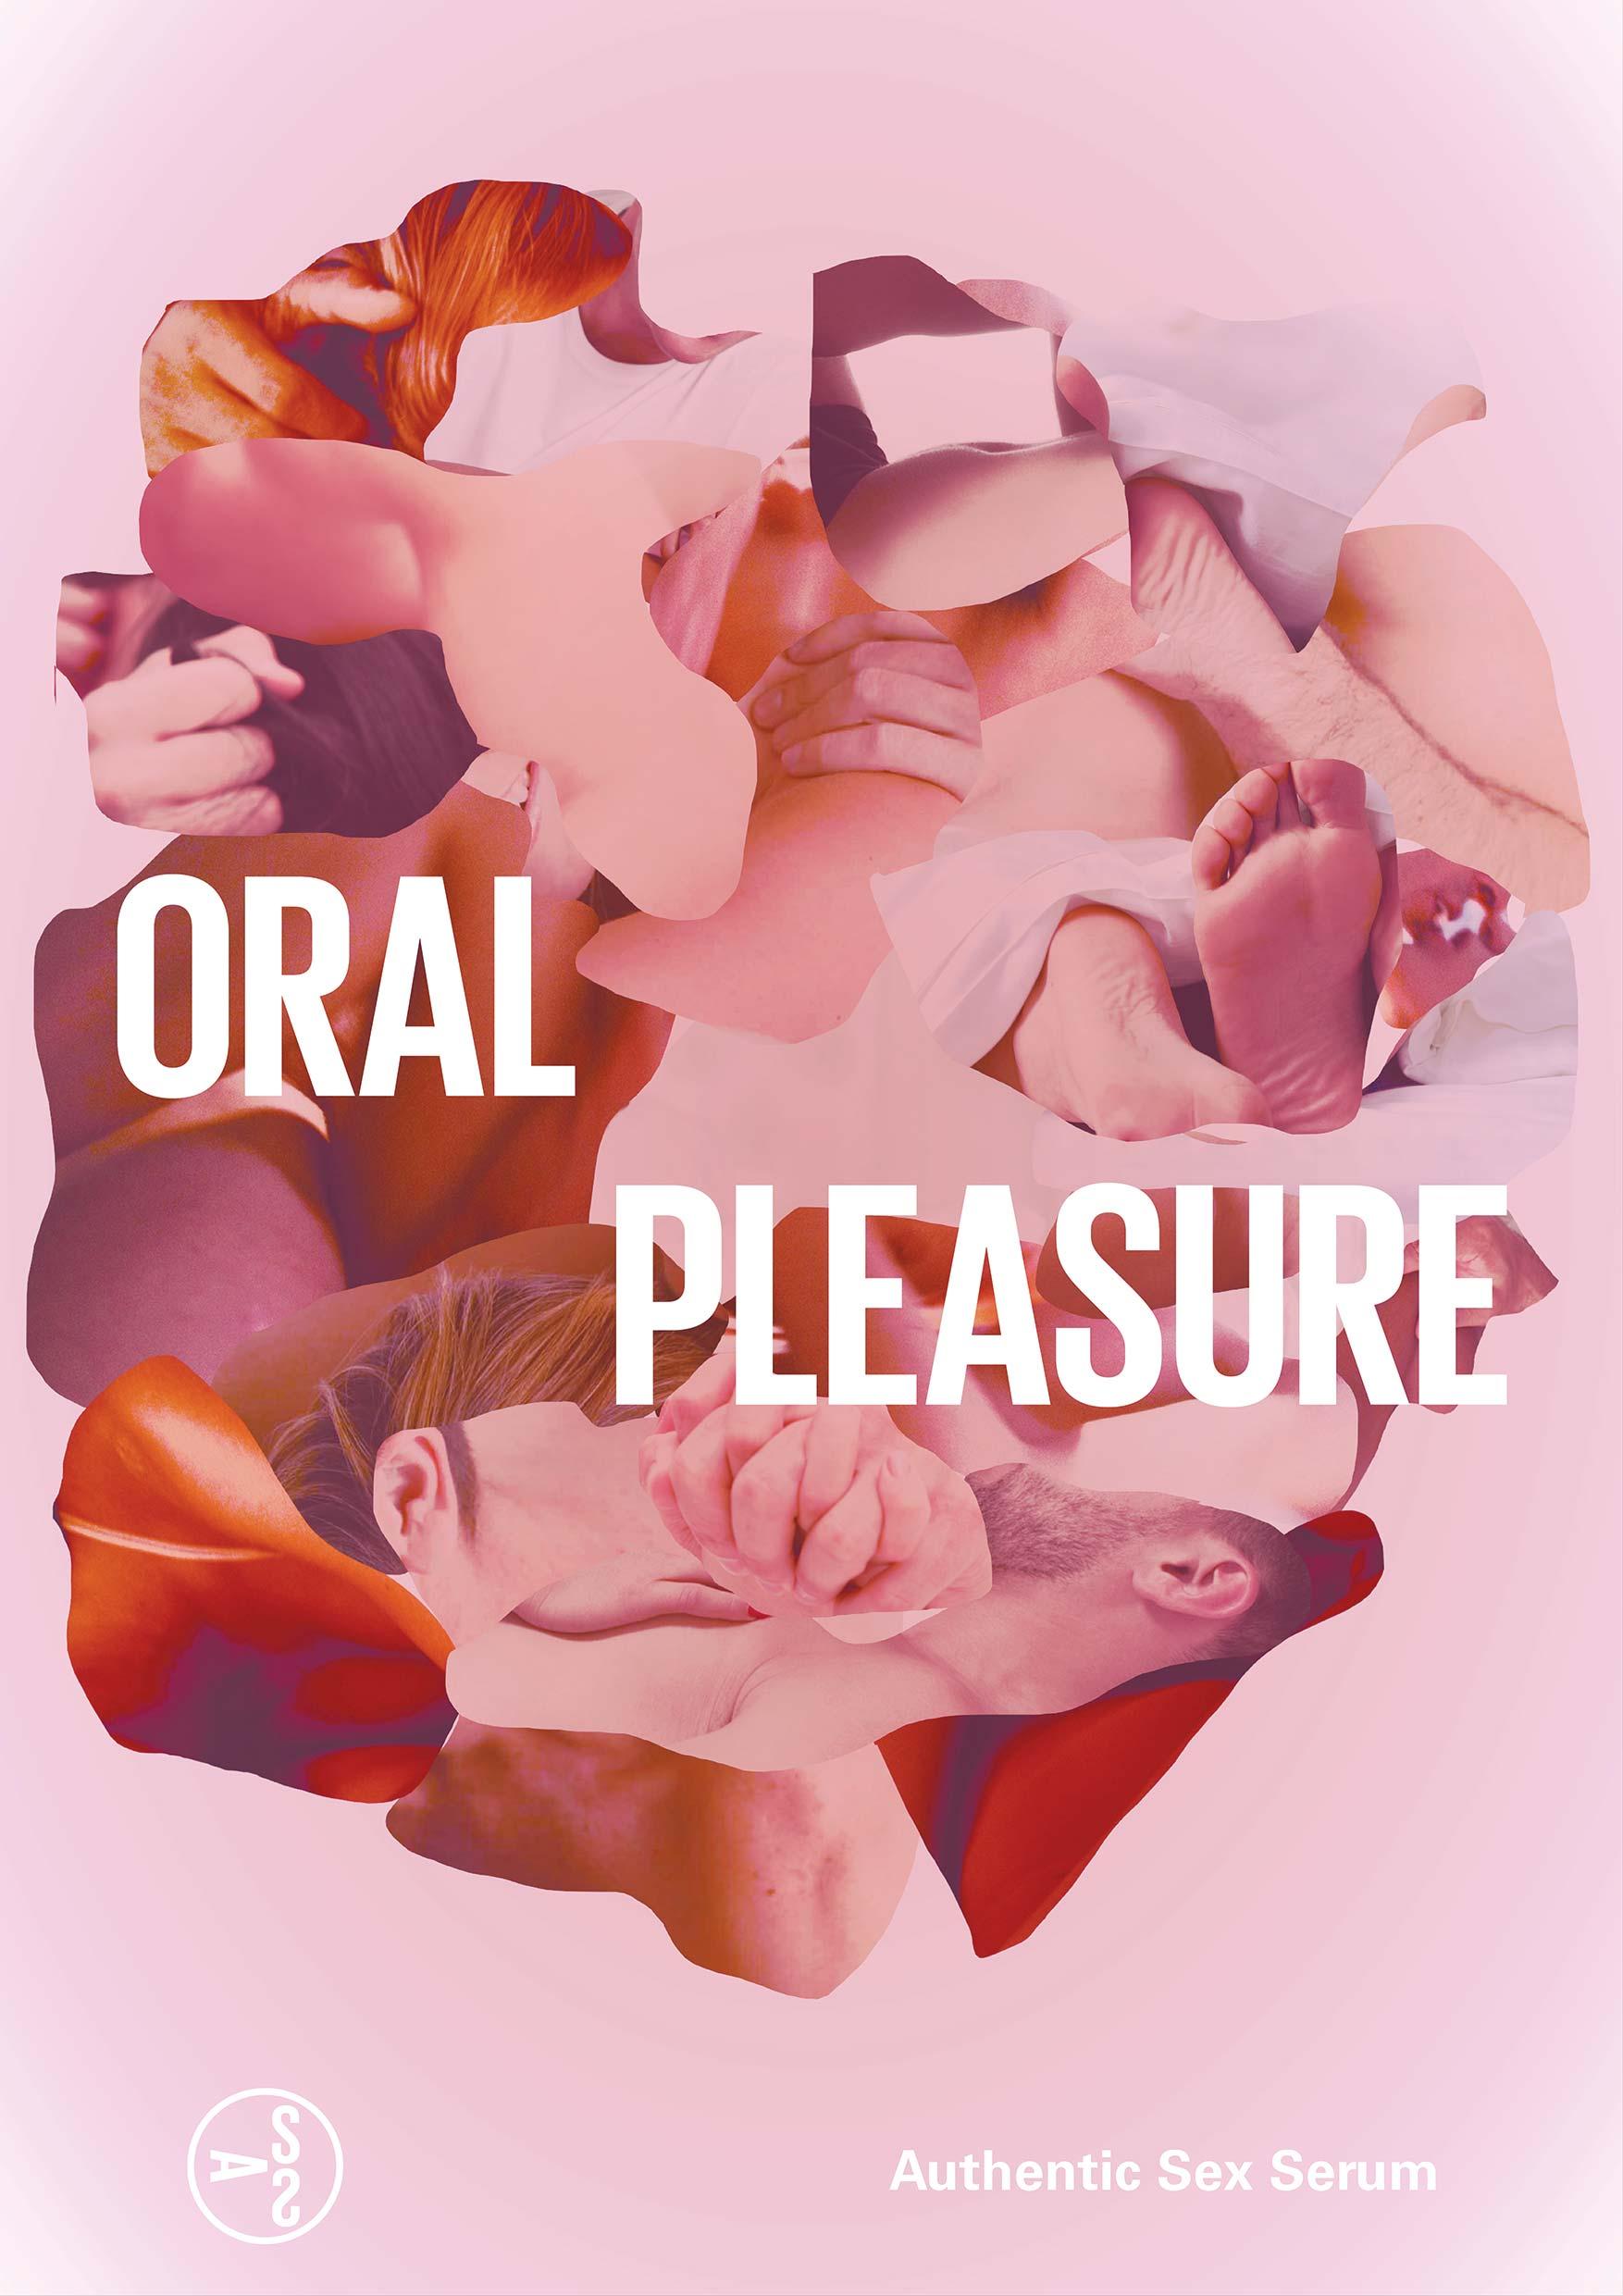 web-Sex-Posters-FINAL2dark1